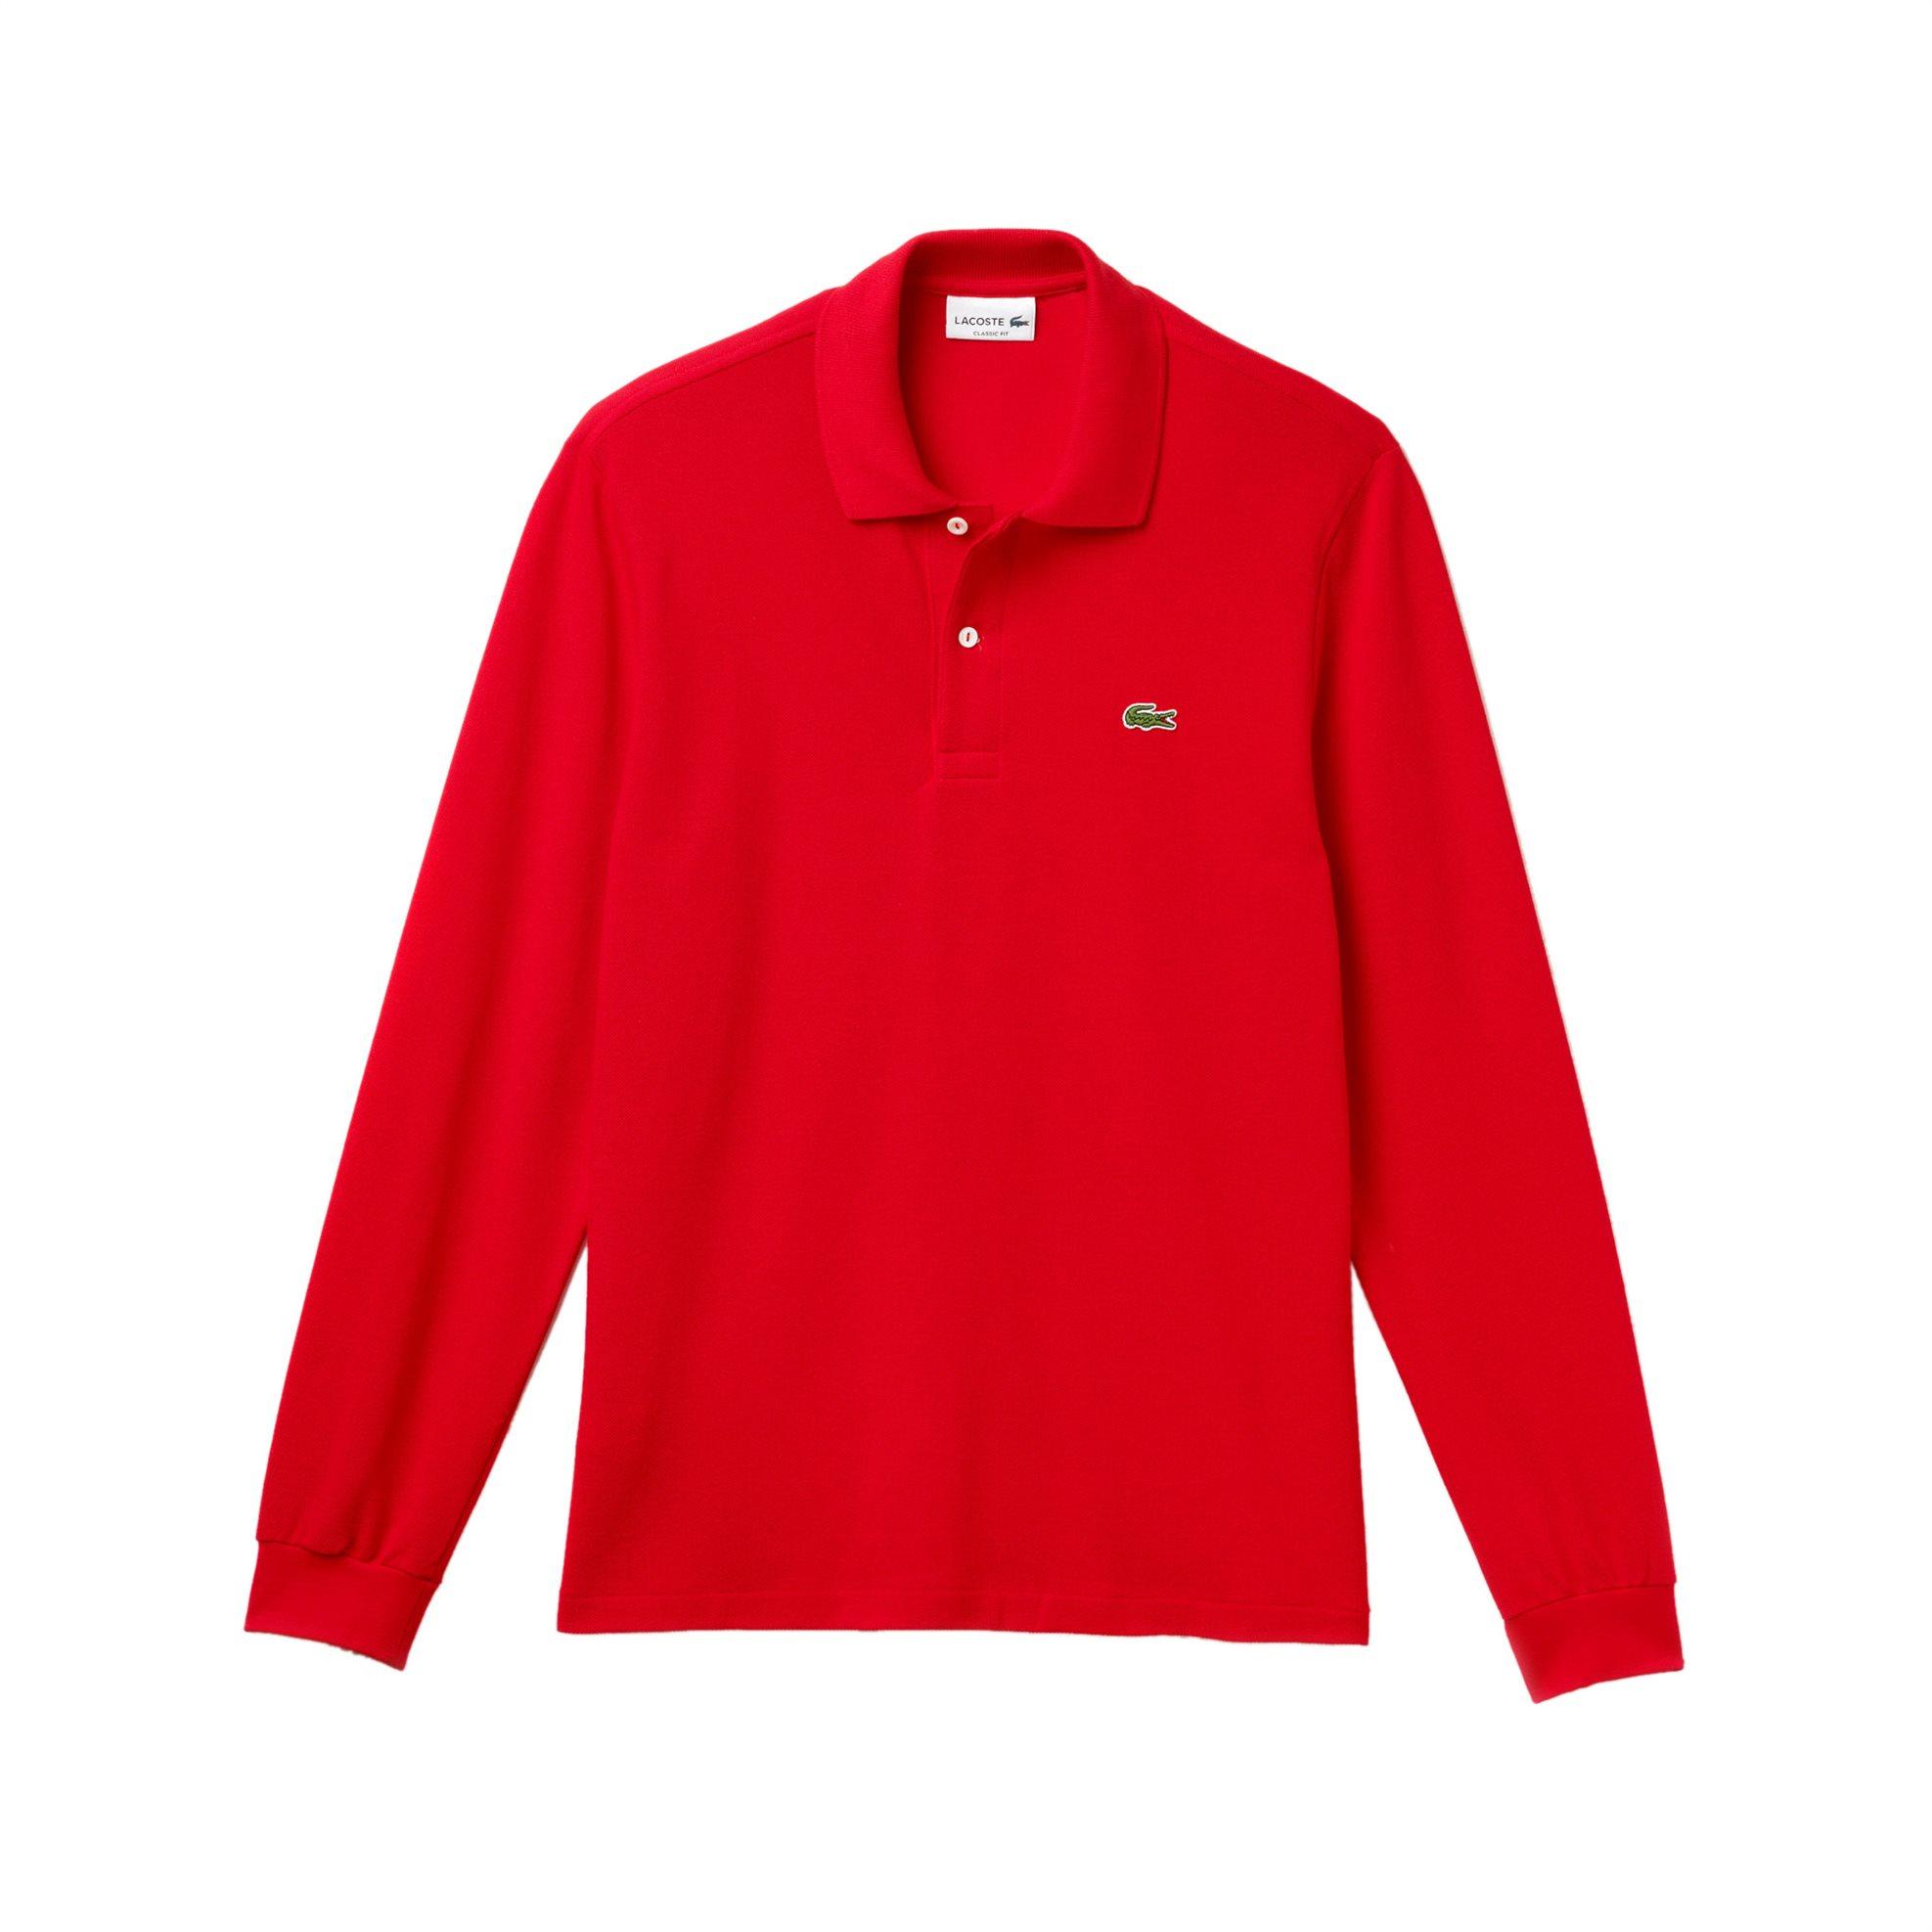 Lacoste ανδρική μπλούζα Polo L.12.12 με μακρύ μανίκι - L1312 - Κόκκινο ανδρασ   ρουχα    νεεσ αφιξεισ   μπλούζες   πόλο